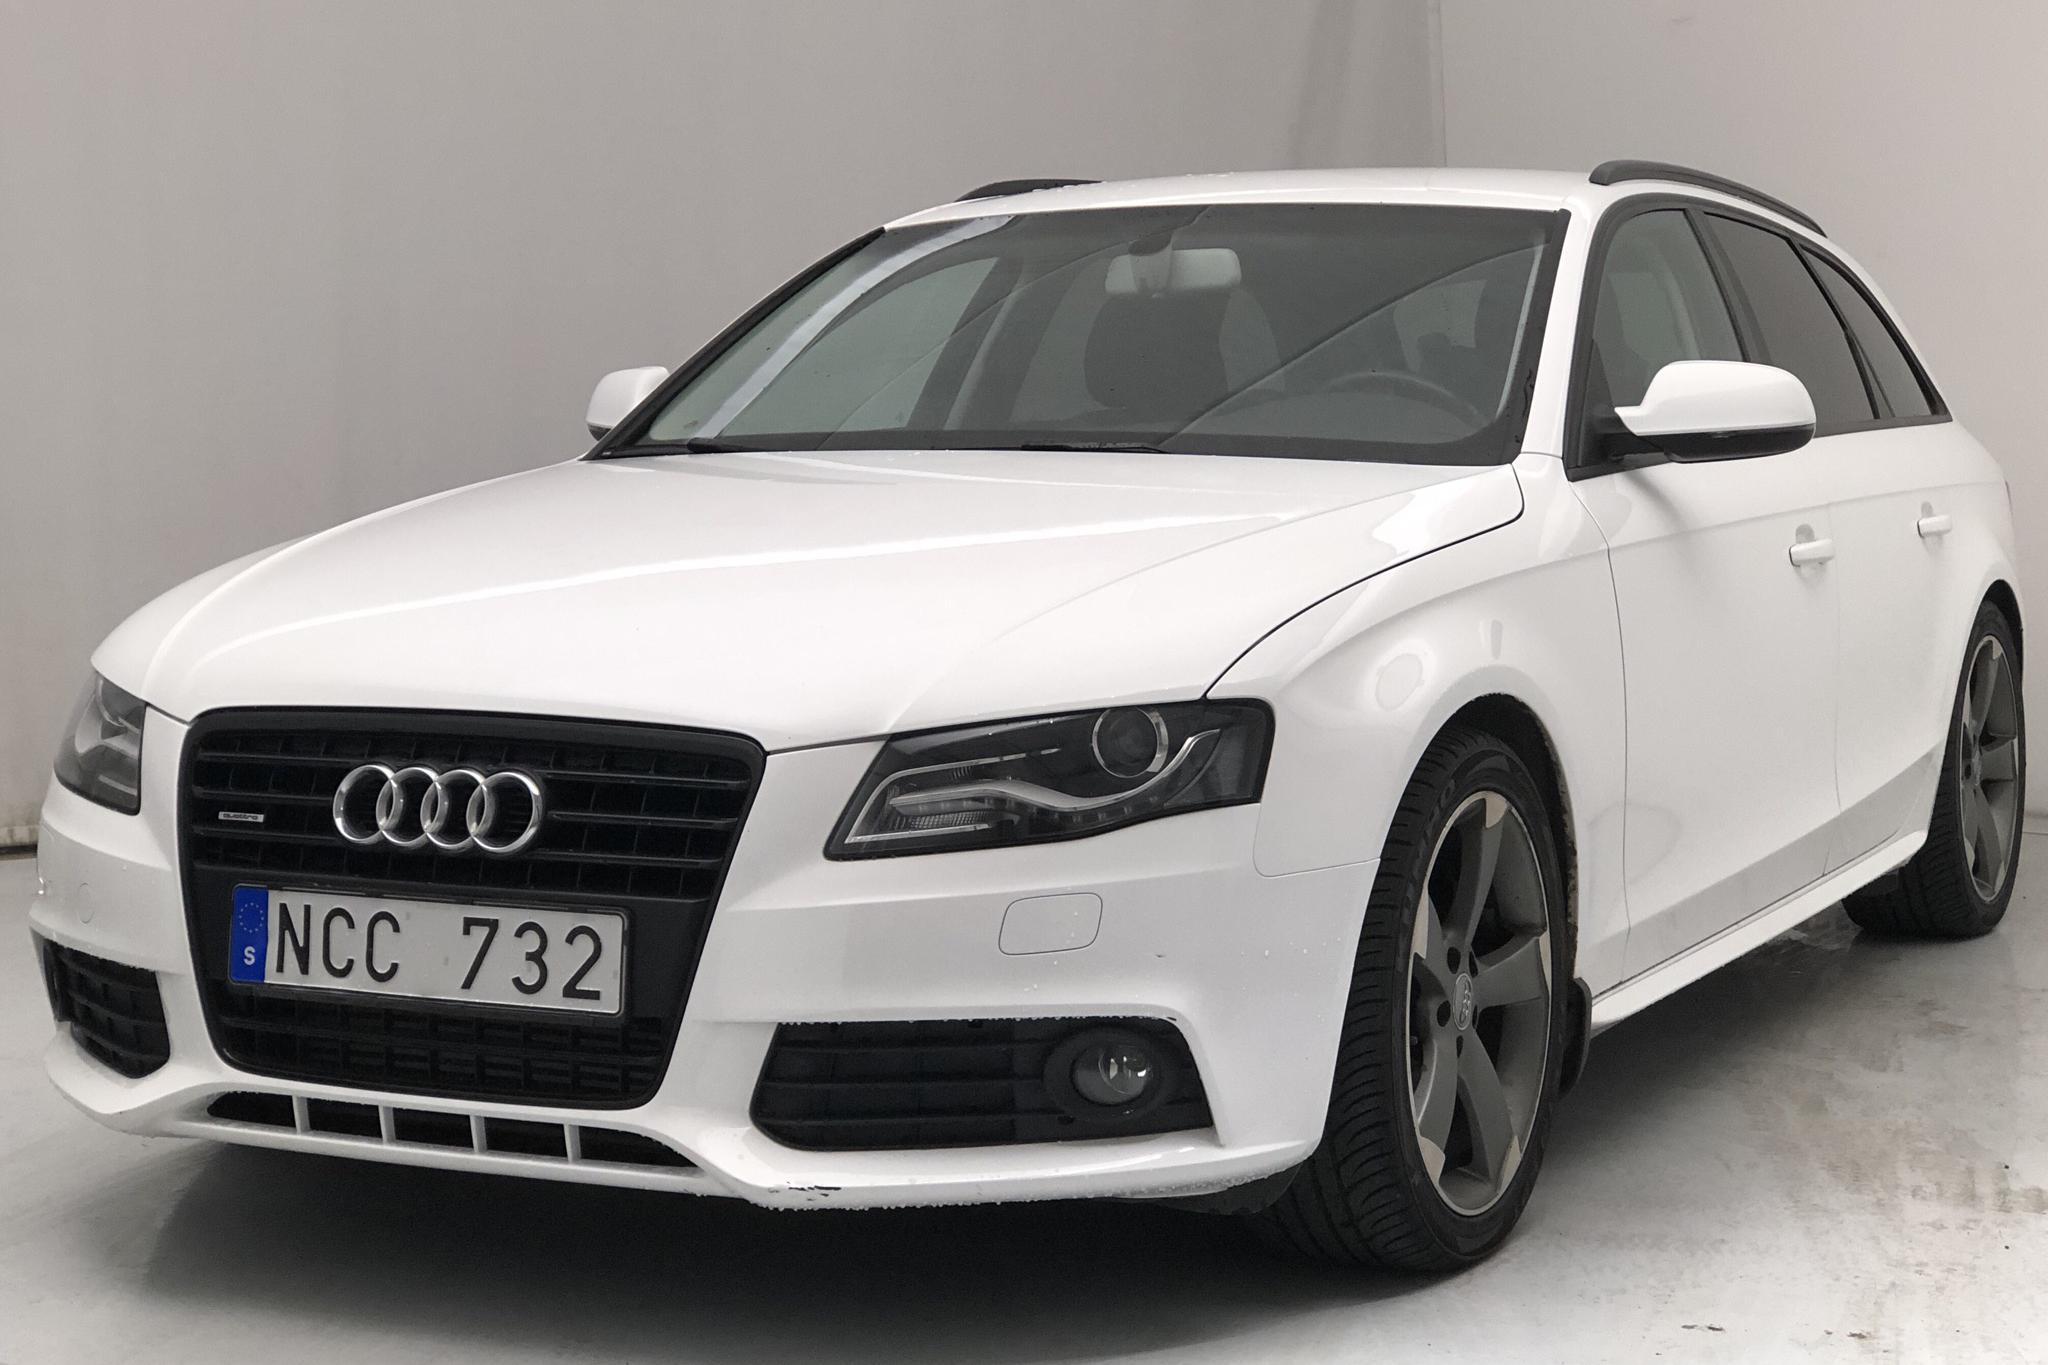 Audi A4 2.0 TFSI Avant quattro (211hk)